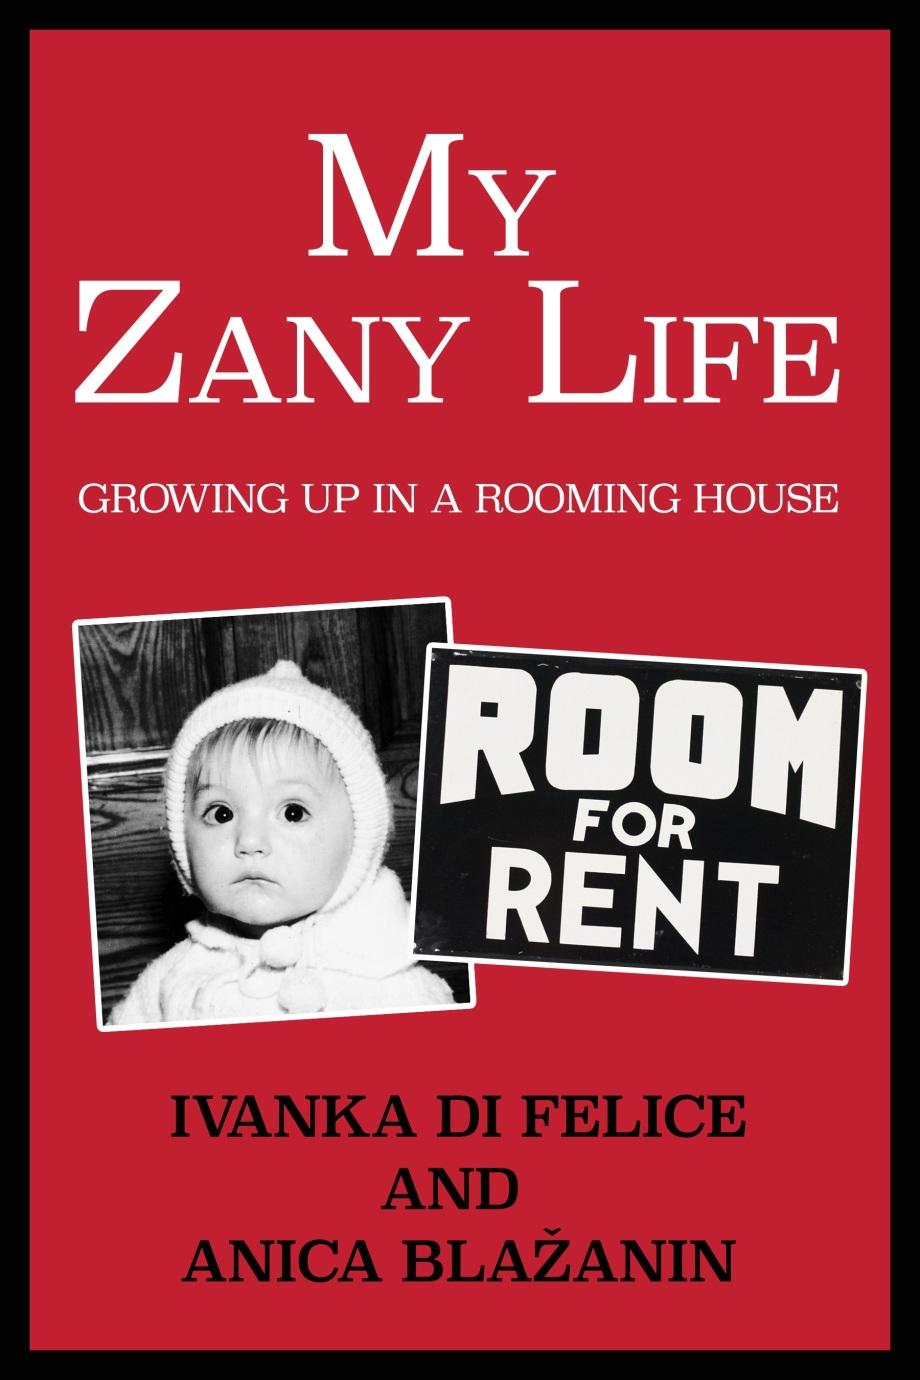 zany-life-final-cover